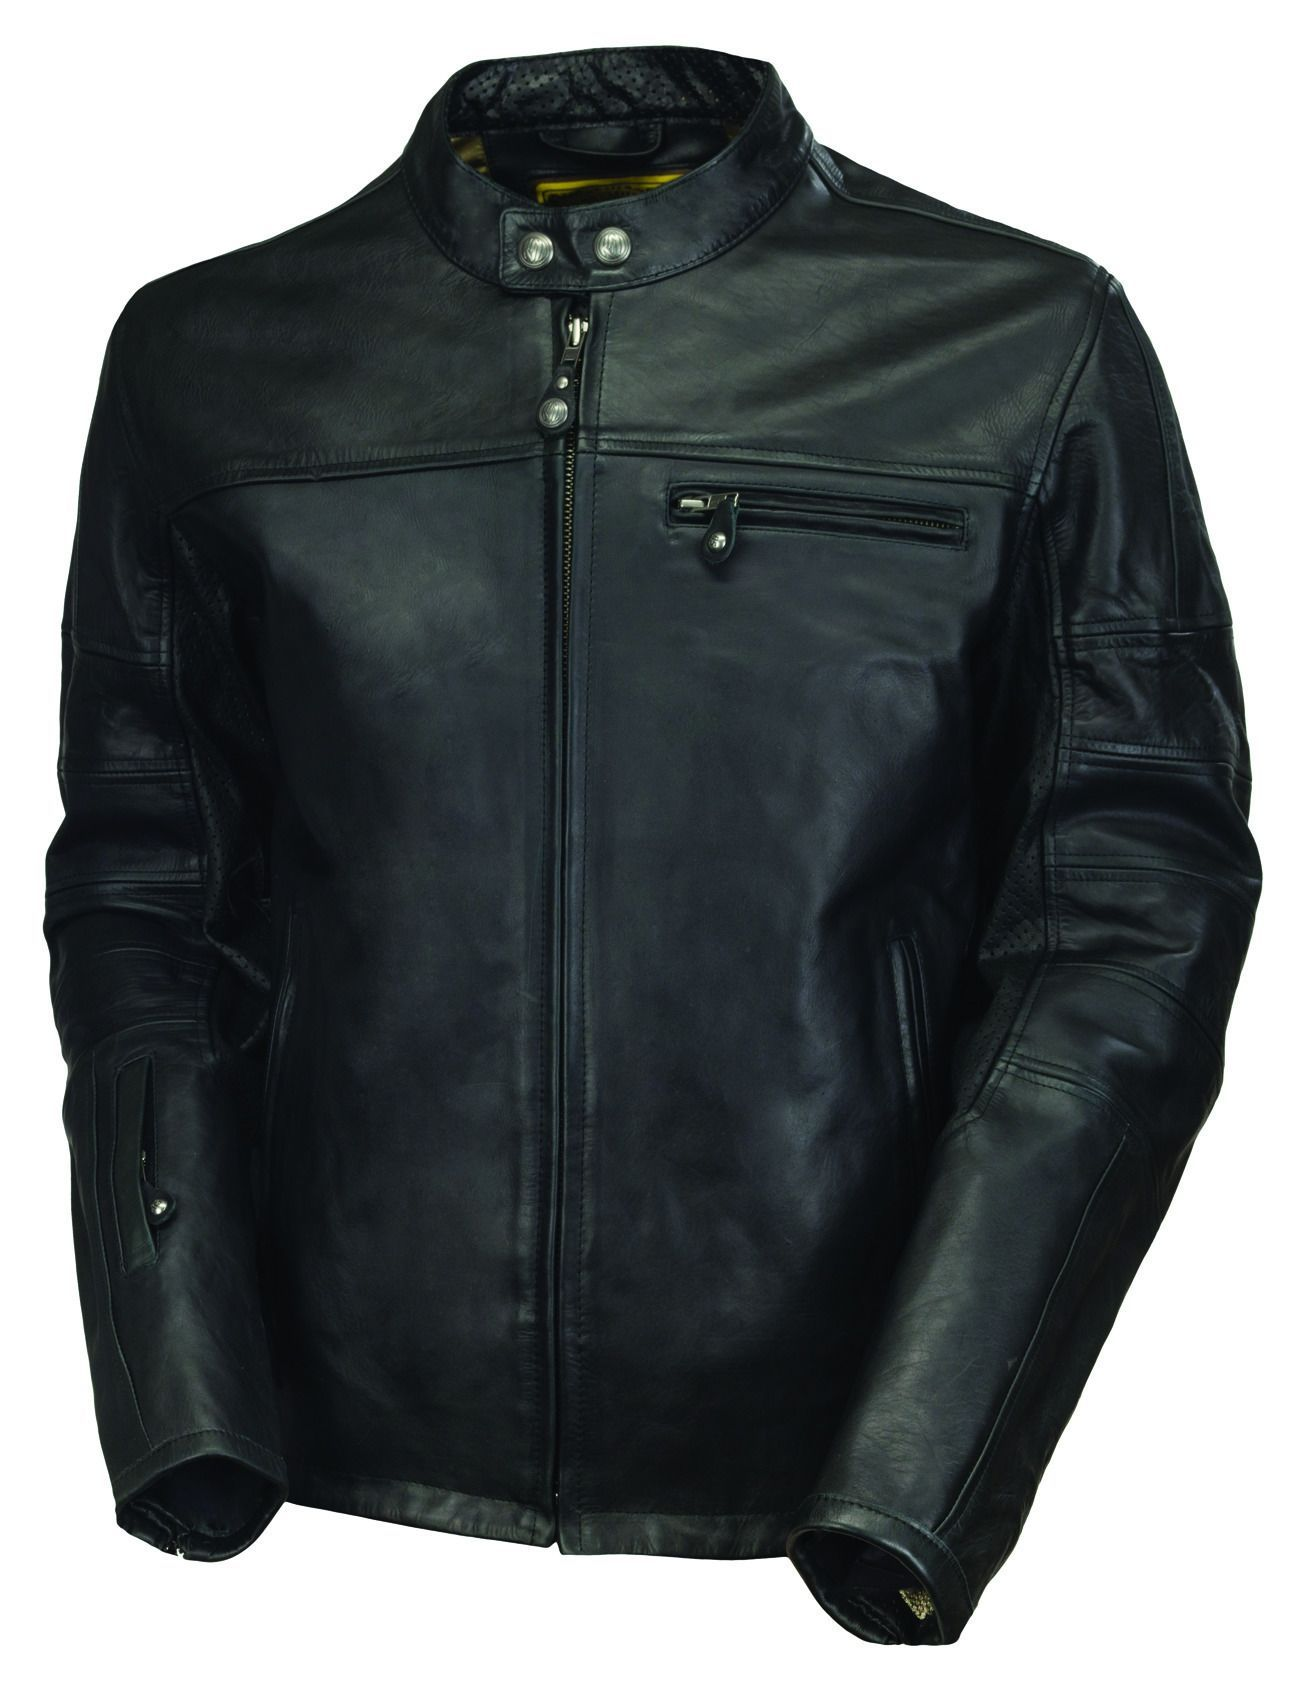 Roland Sands Ronin Leather Jacket Revzilla Leather Jacket Leather Jacket Black Roland Sands Design [ 1688 x 1304 Pixel ]